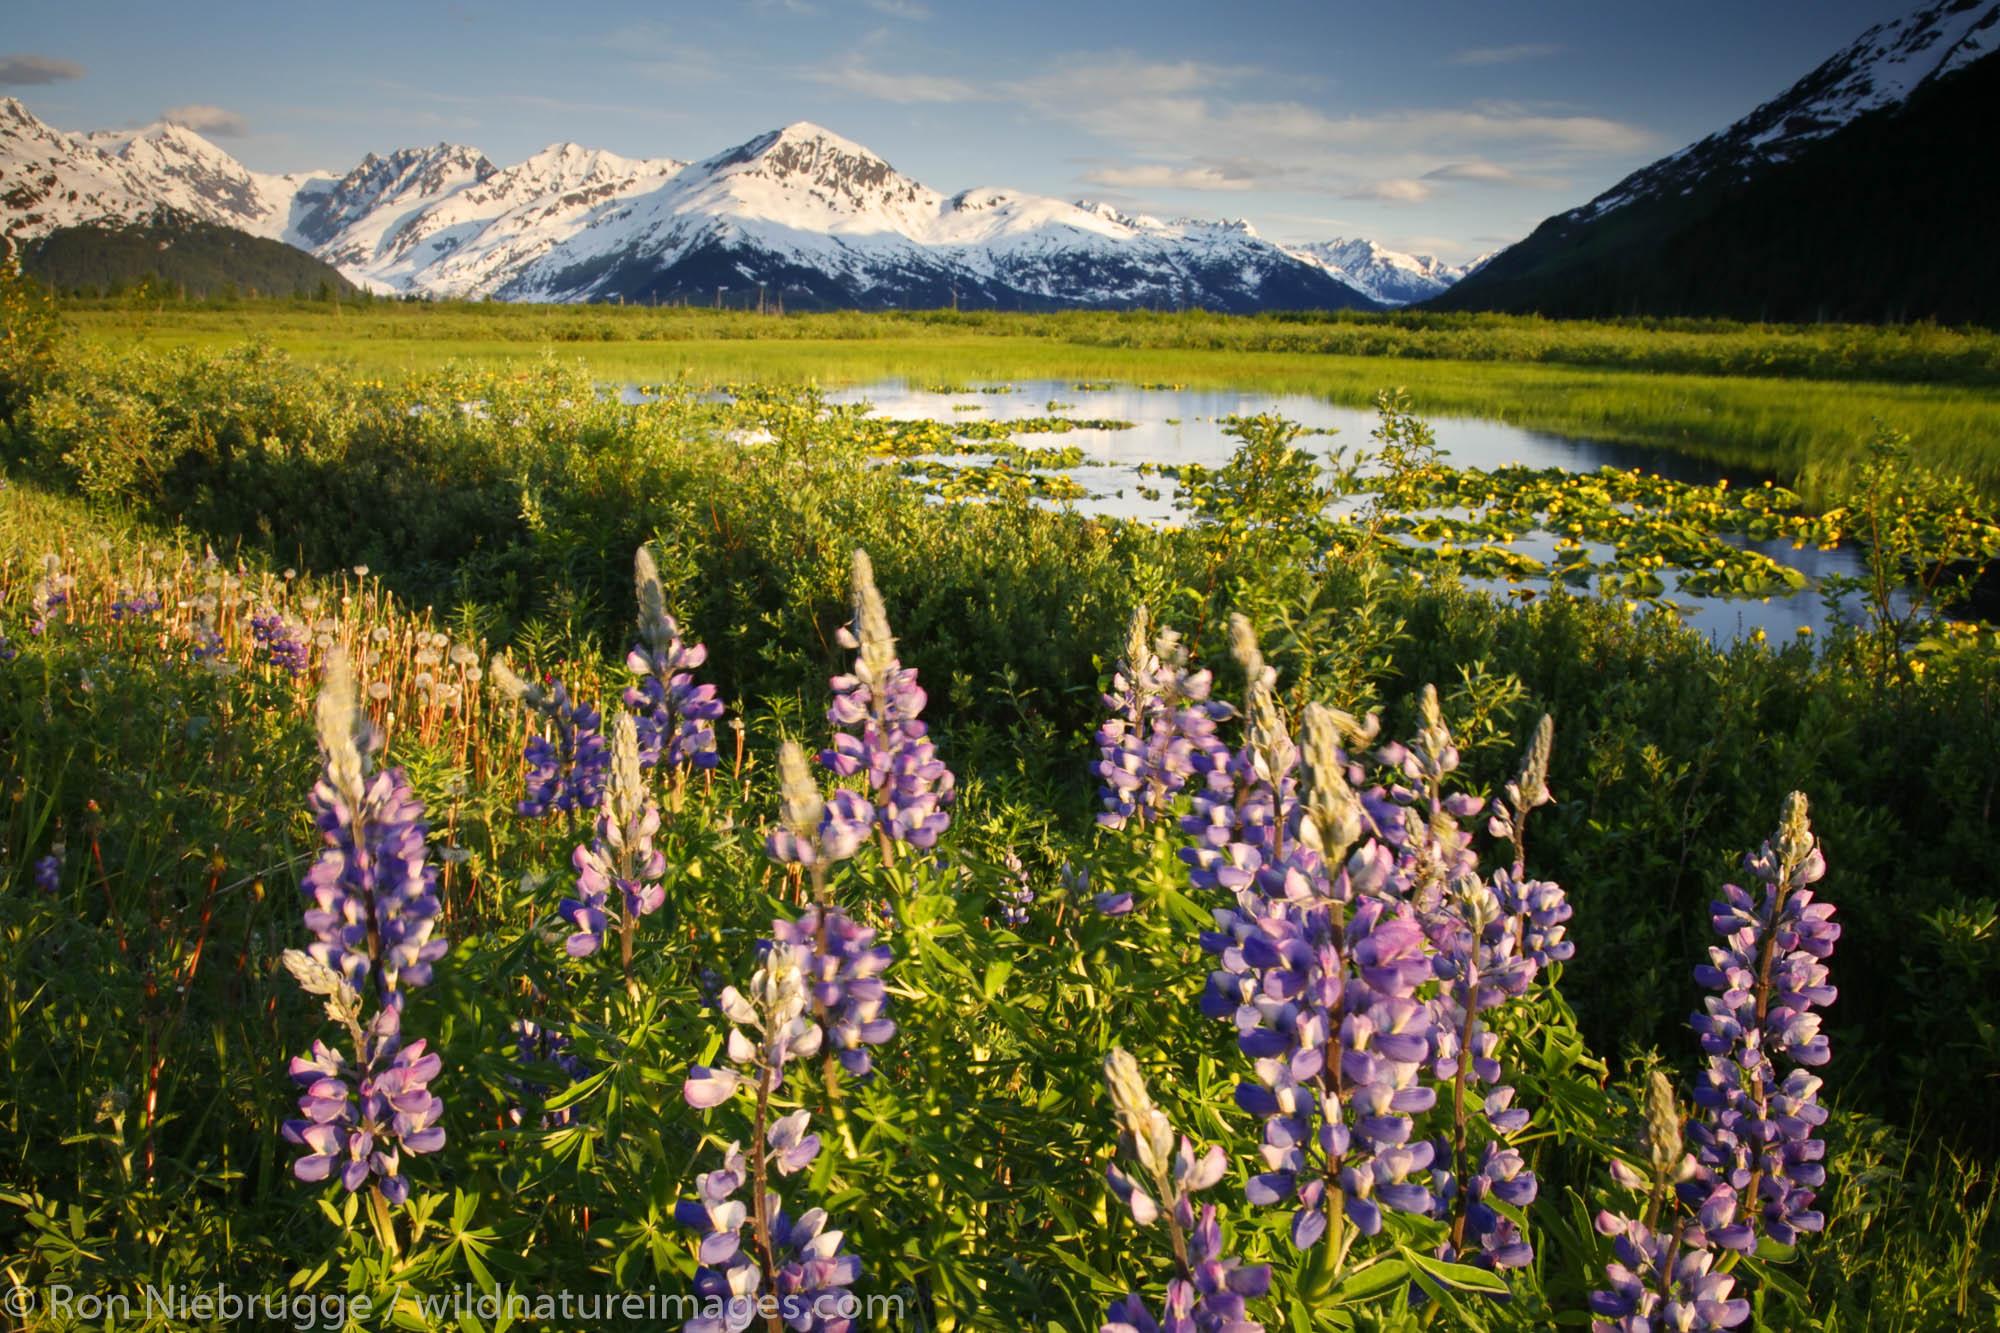 Lupine blooms along Turnagain Arm, Chugach National Forest, Alaska.